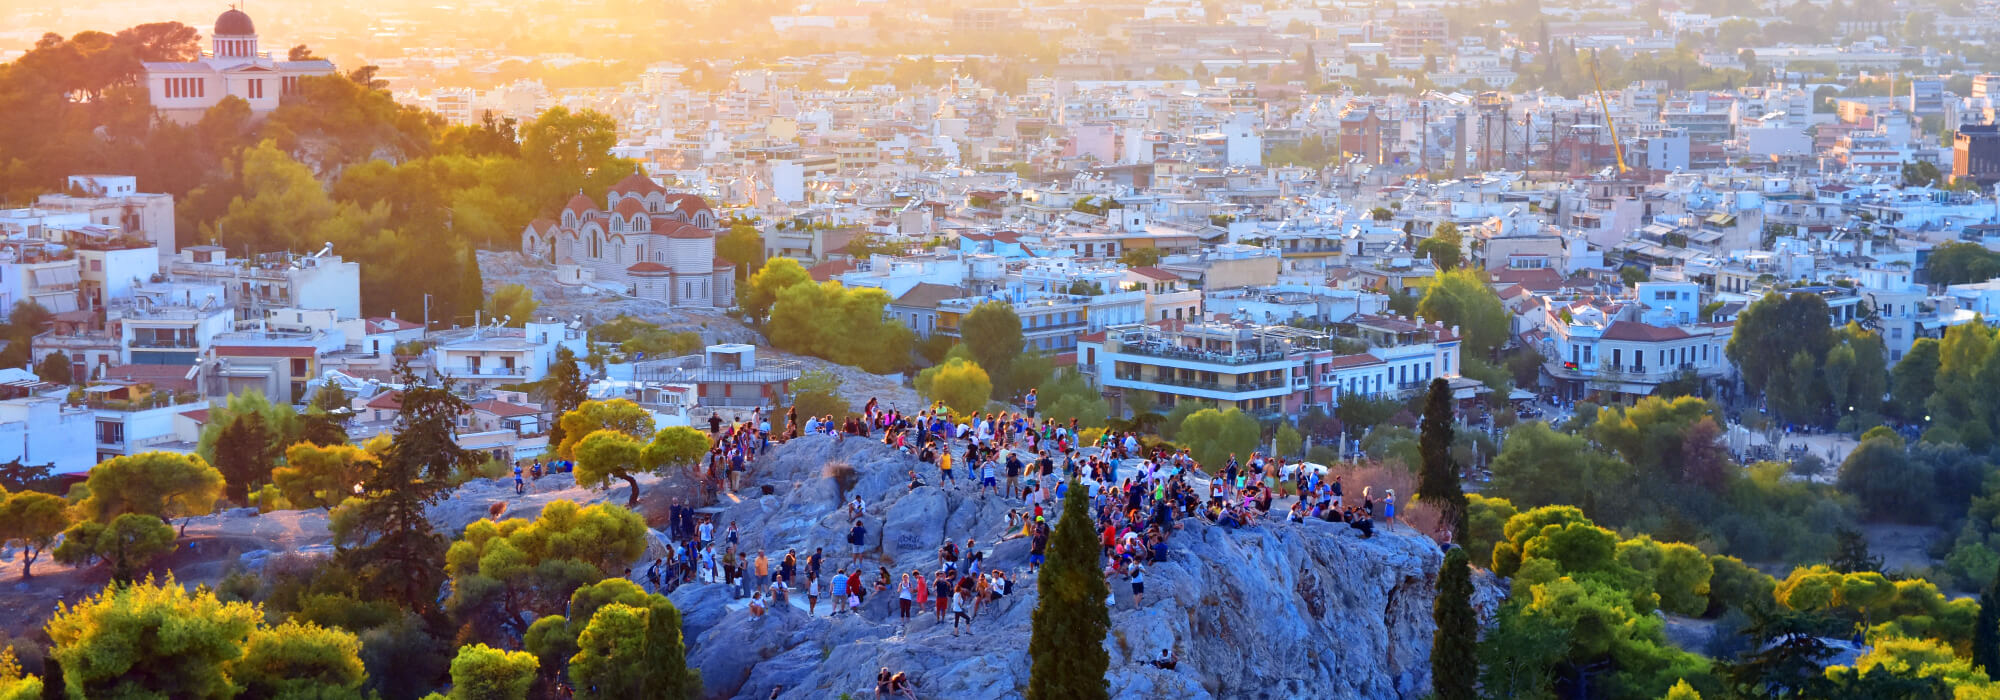 Acropolis Of Athens Guided Tour